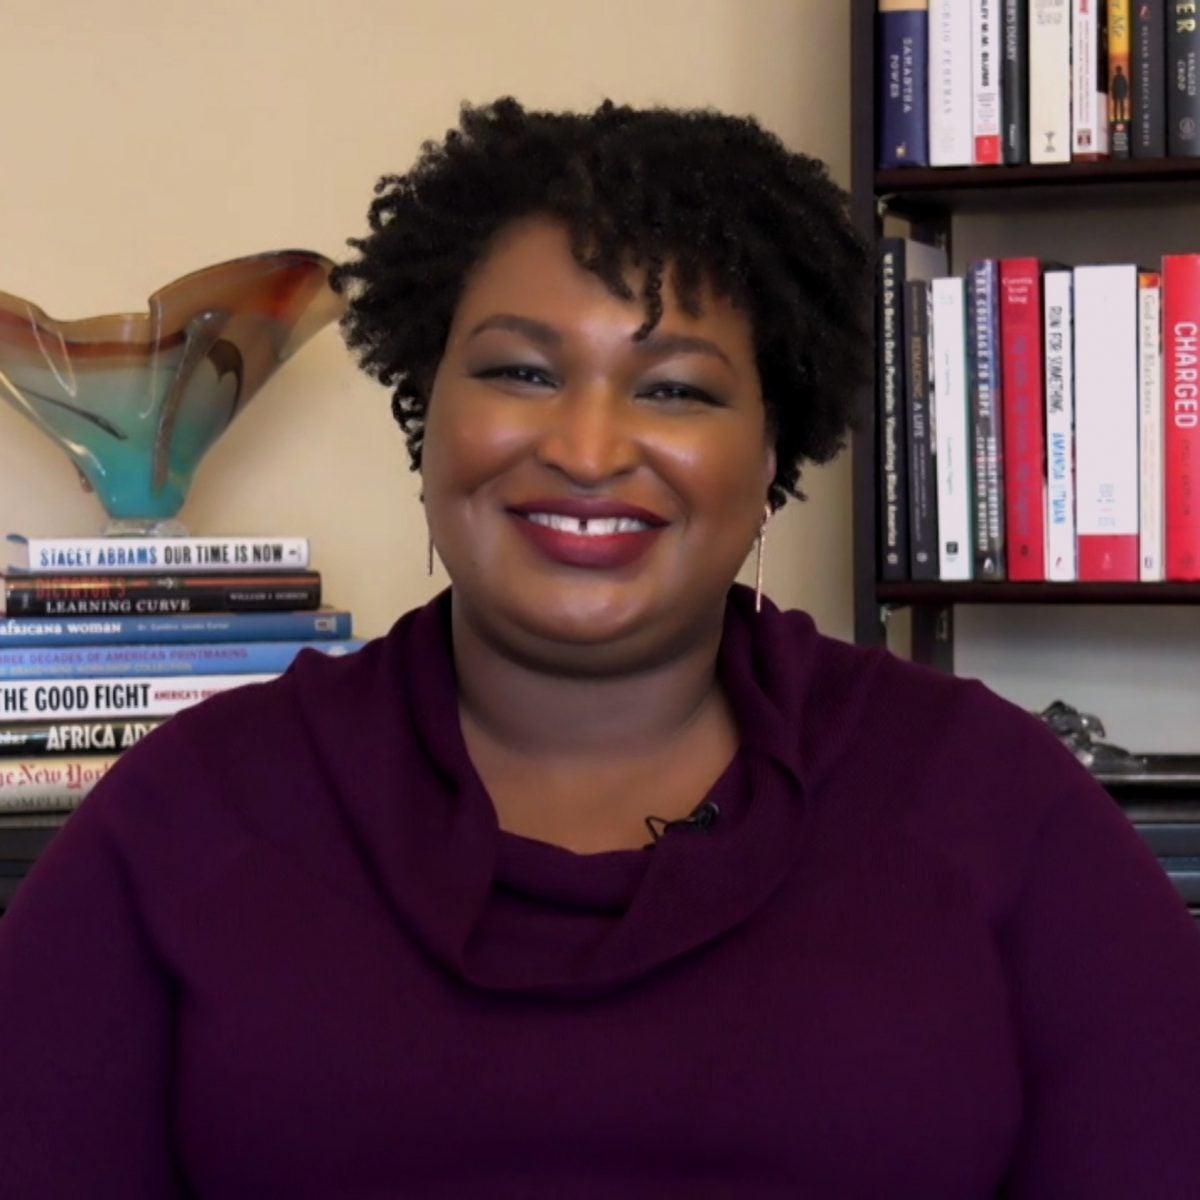 Stacey Abrams Slams Georgia Republicans' EffortsToRestrict Voting